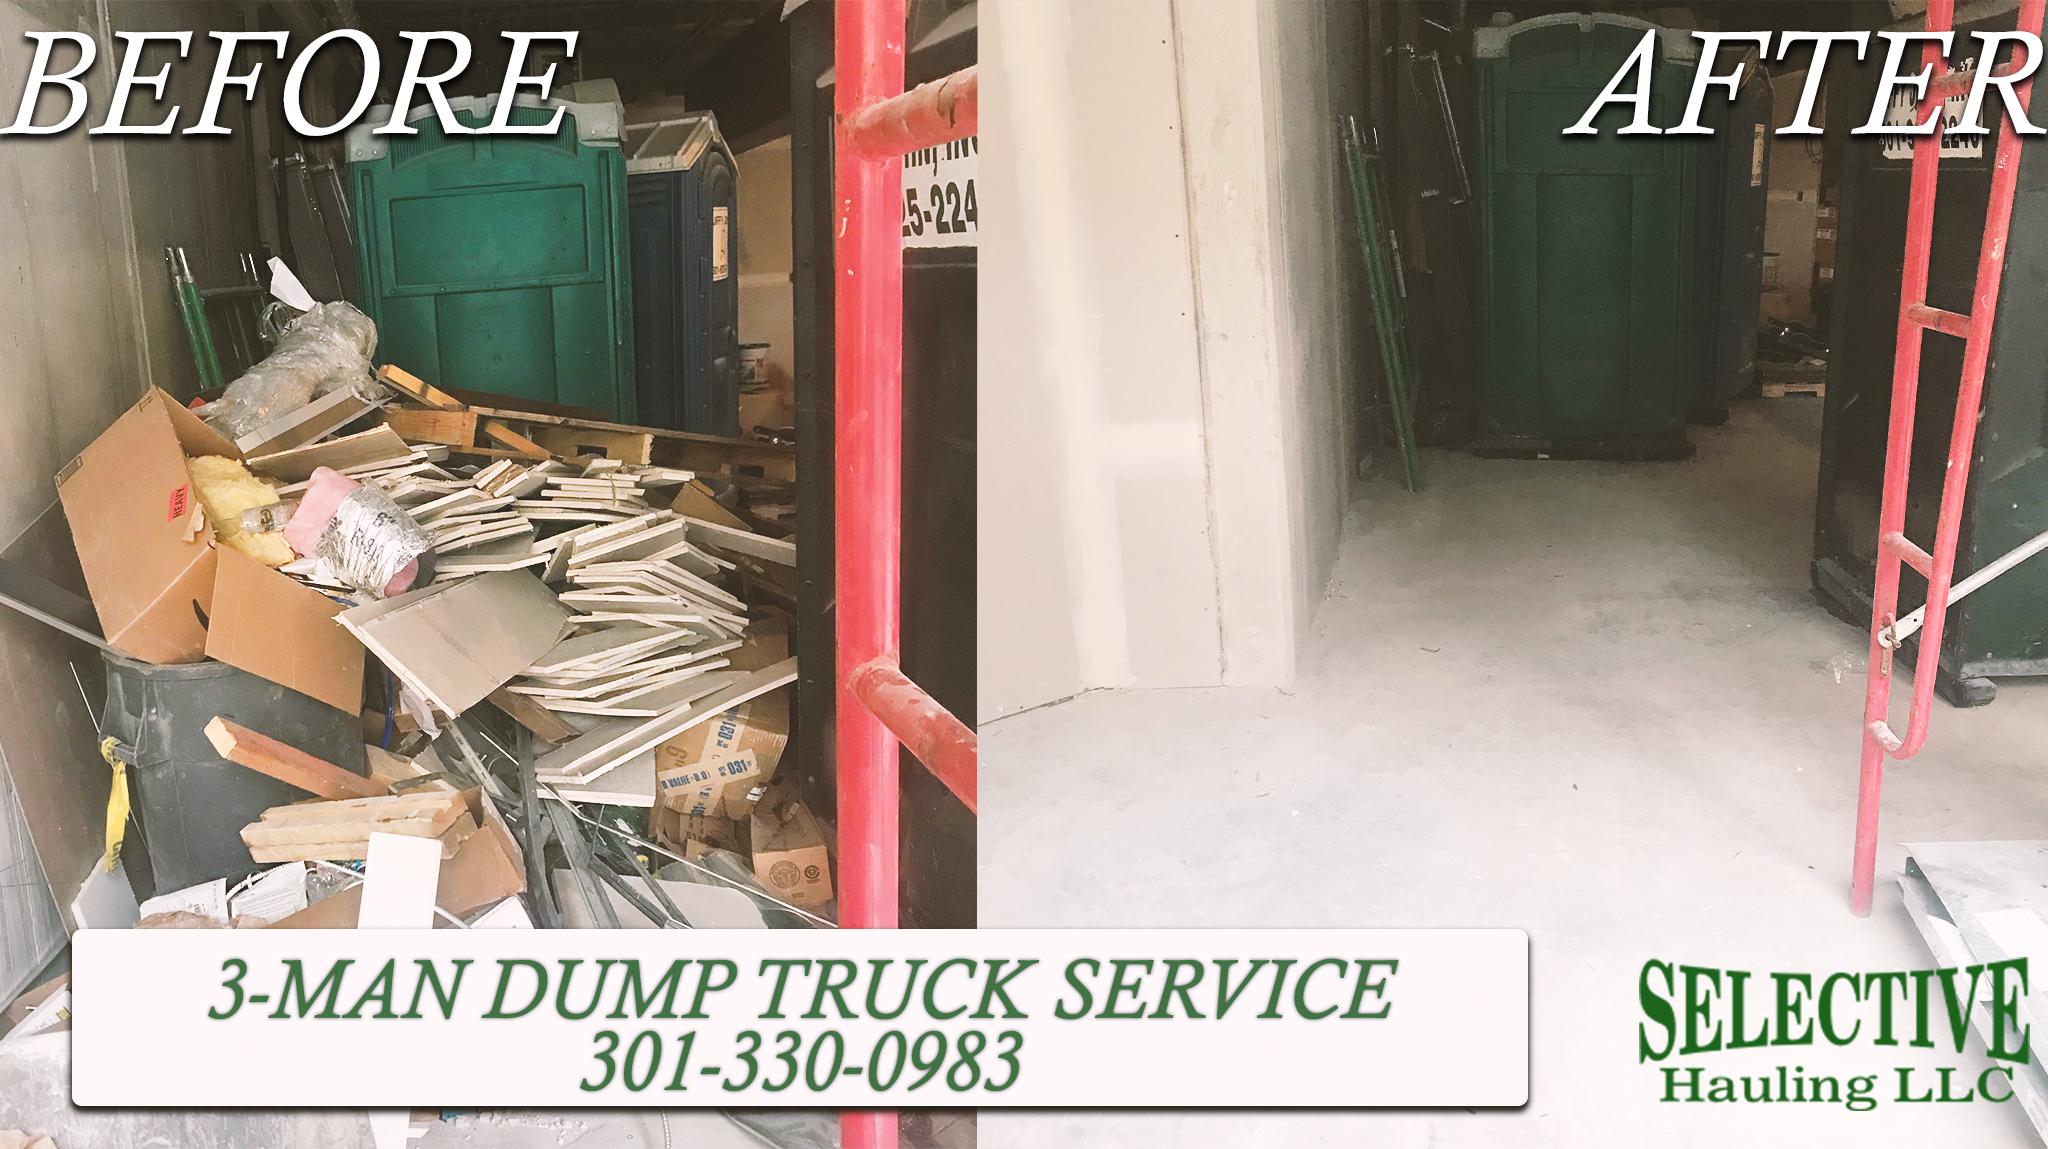 Arlington junk removal service